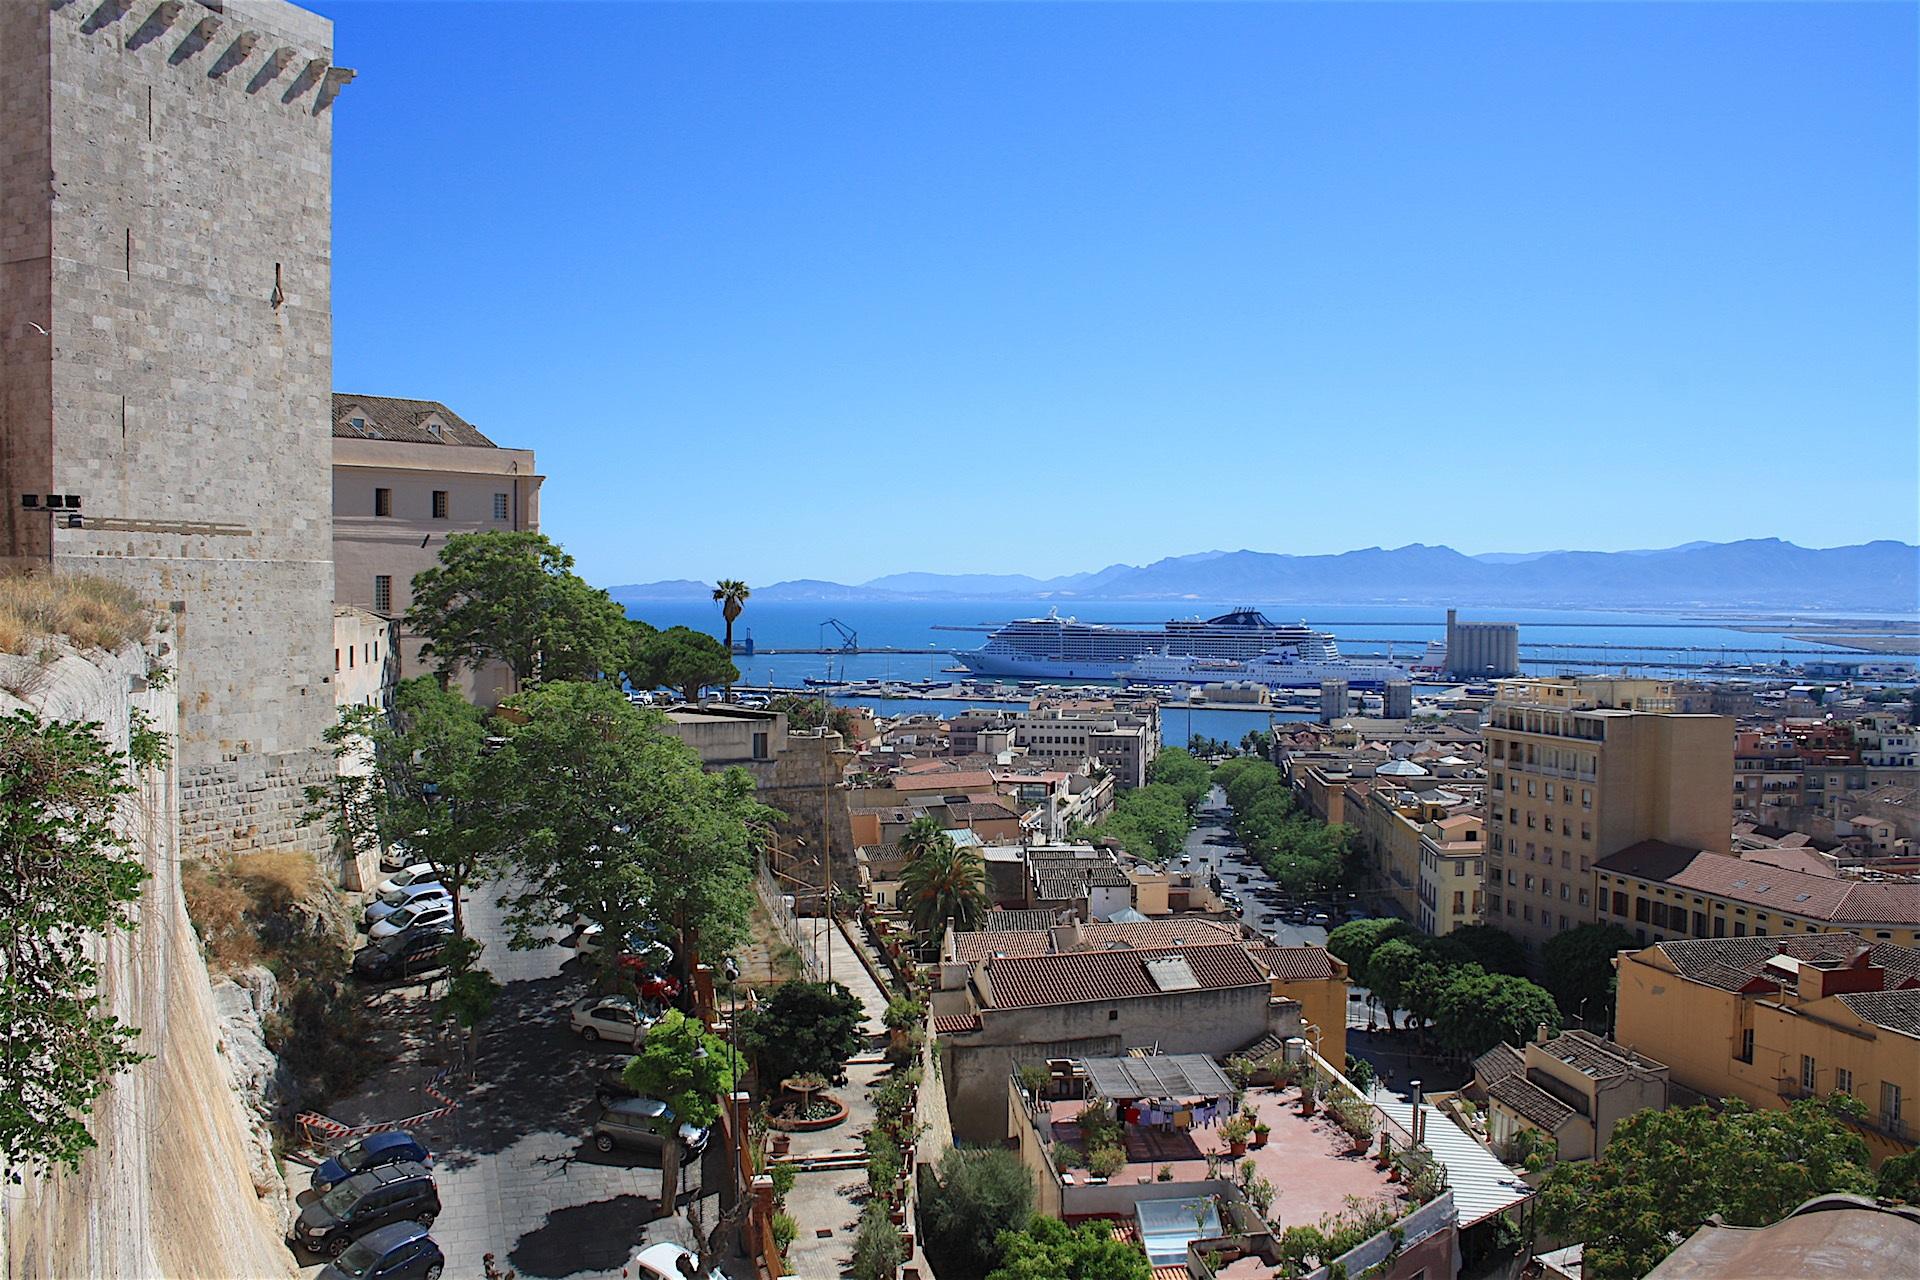 The stunning Mediterranean islands Cagliari is full of old world Italian charm